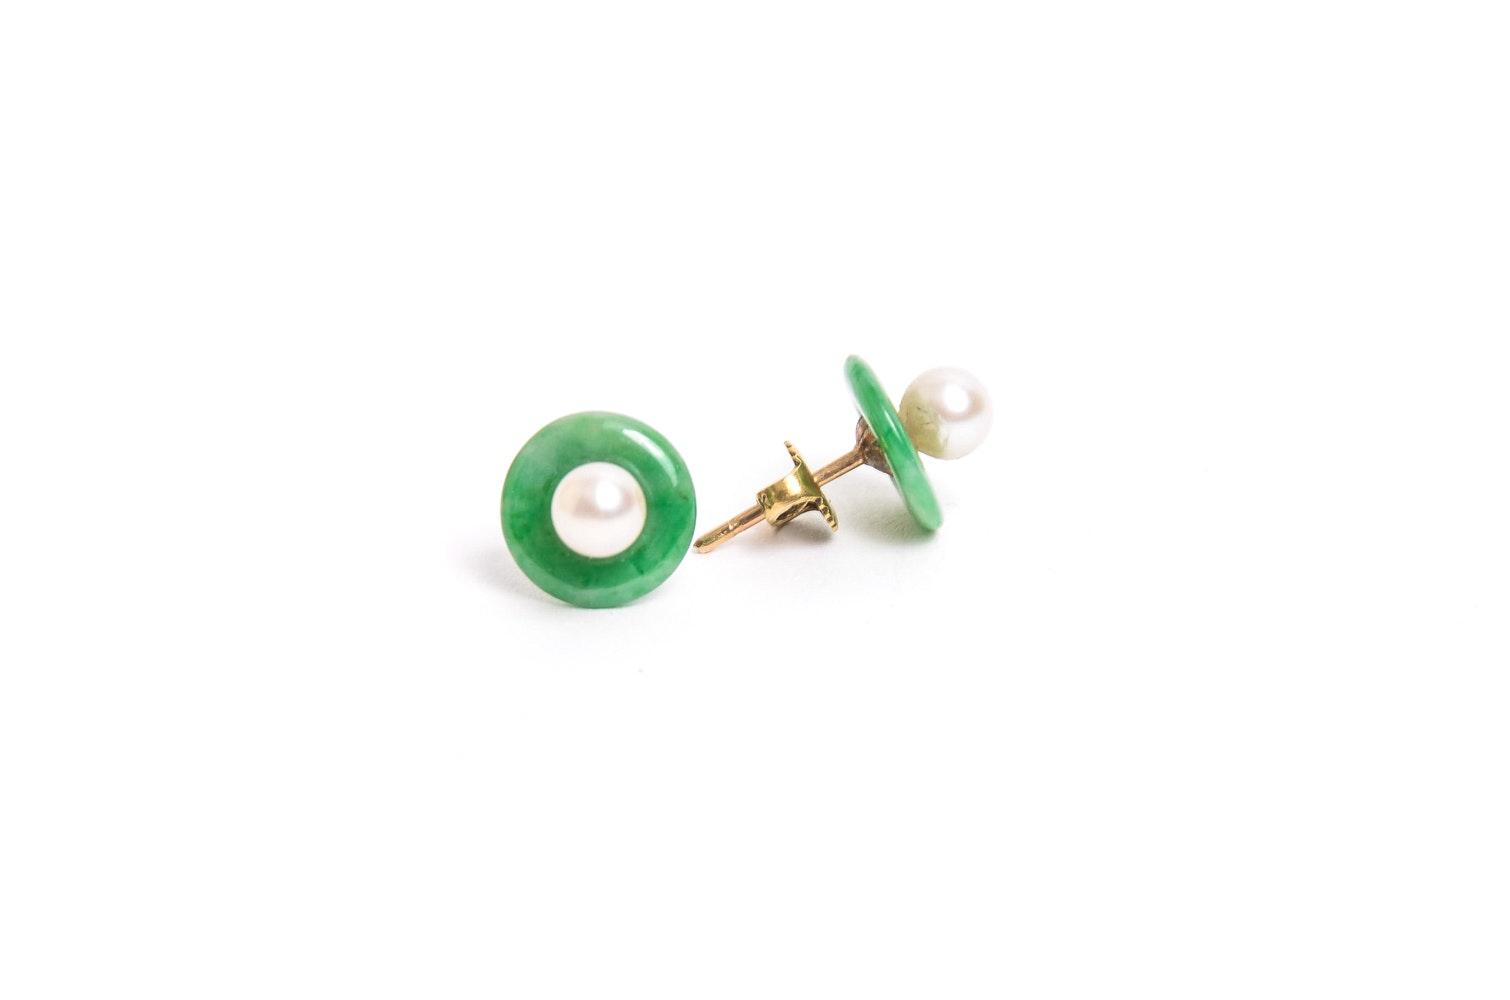 14K Gold Pearl and Jadeite Earrings